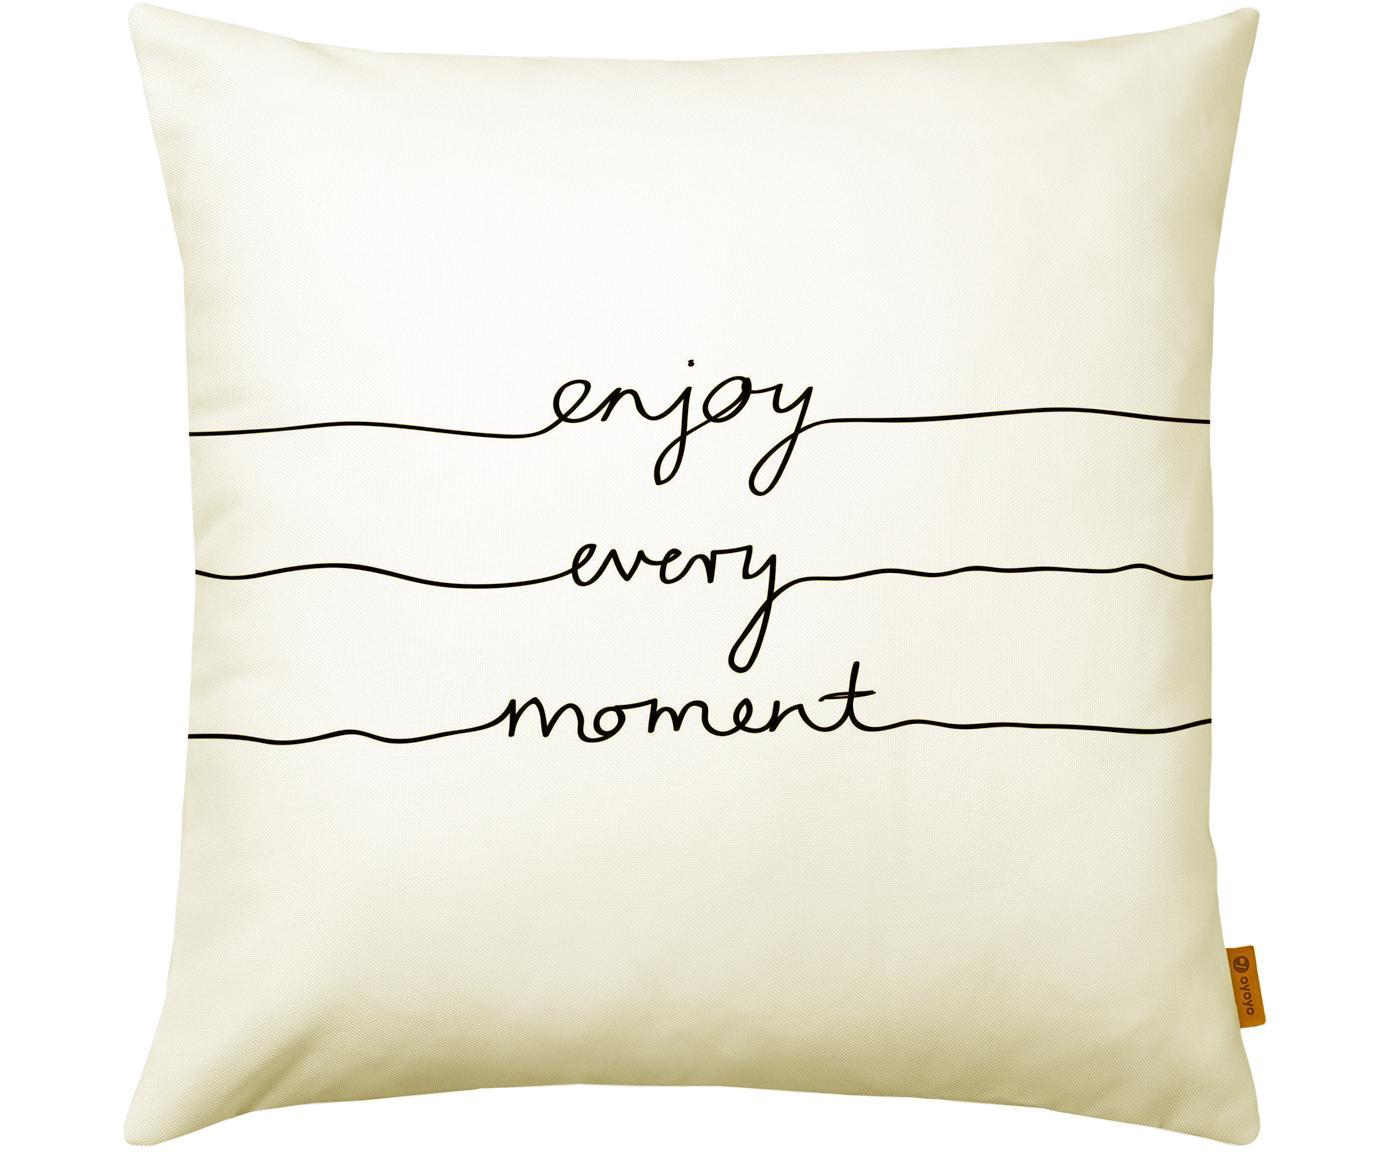 Kissenhülle Enjoy Every Moment mit Schriftzug, 100% Polyester, Cremeweiß, Schwarz, 50 x 50 cm